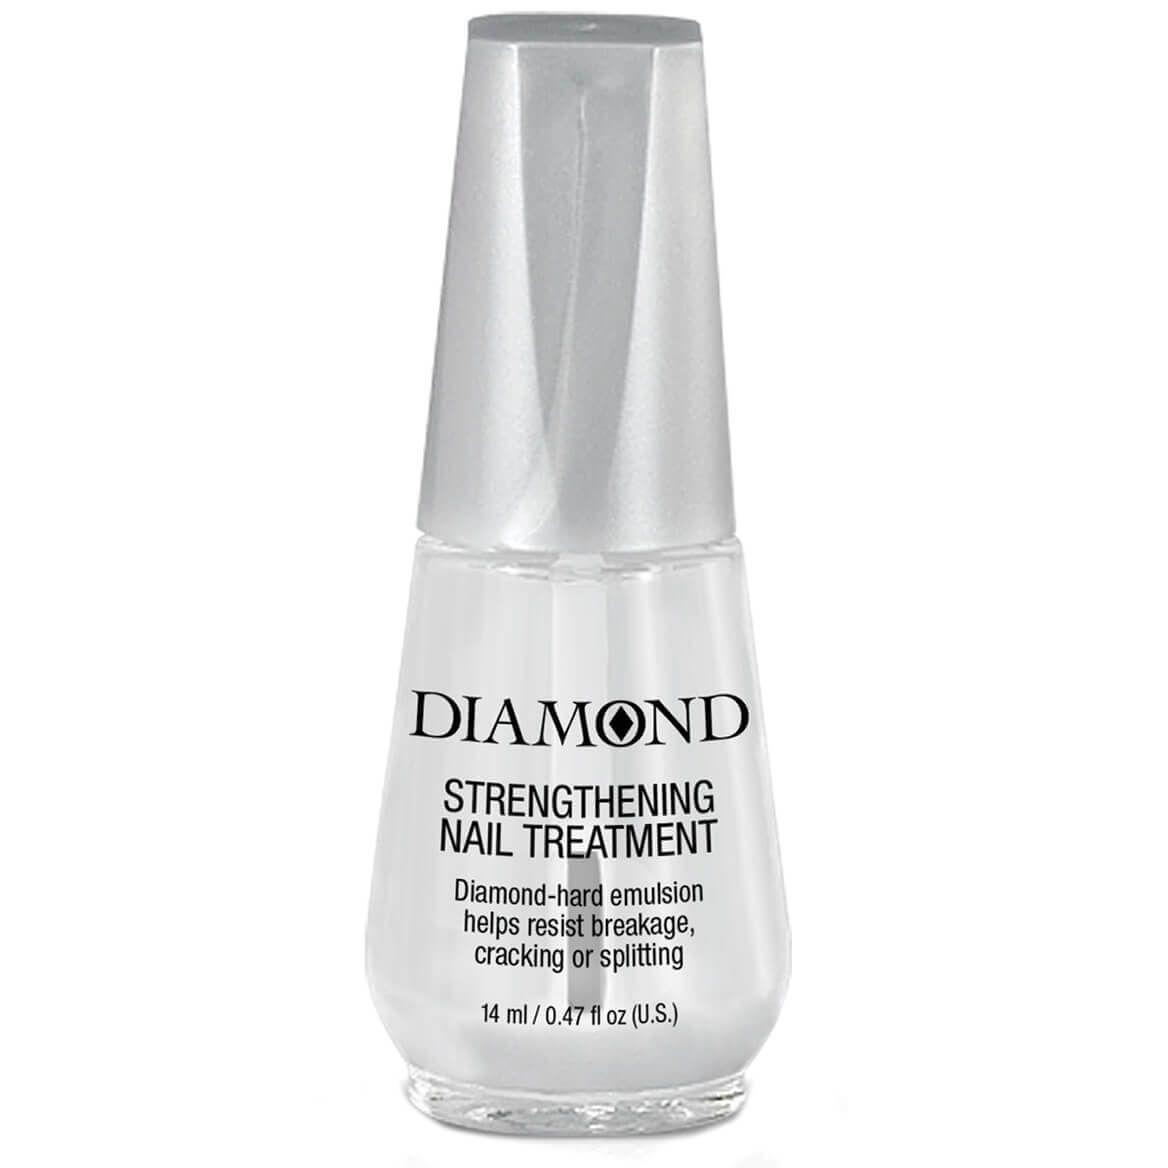 Diamond Strengthening Nail Treatment-361323